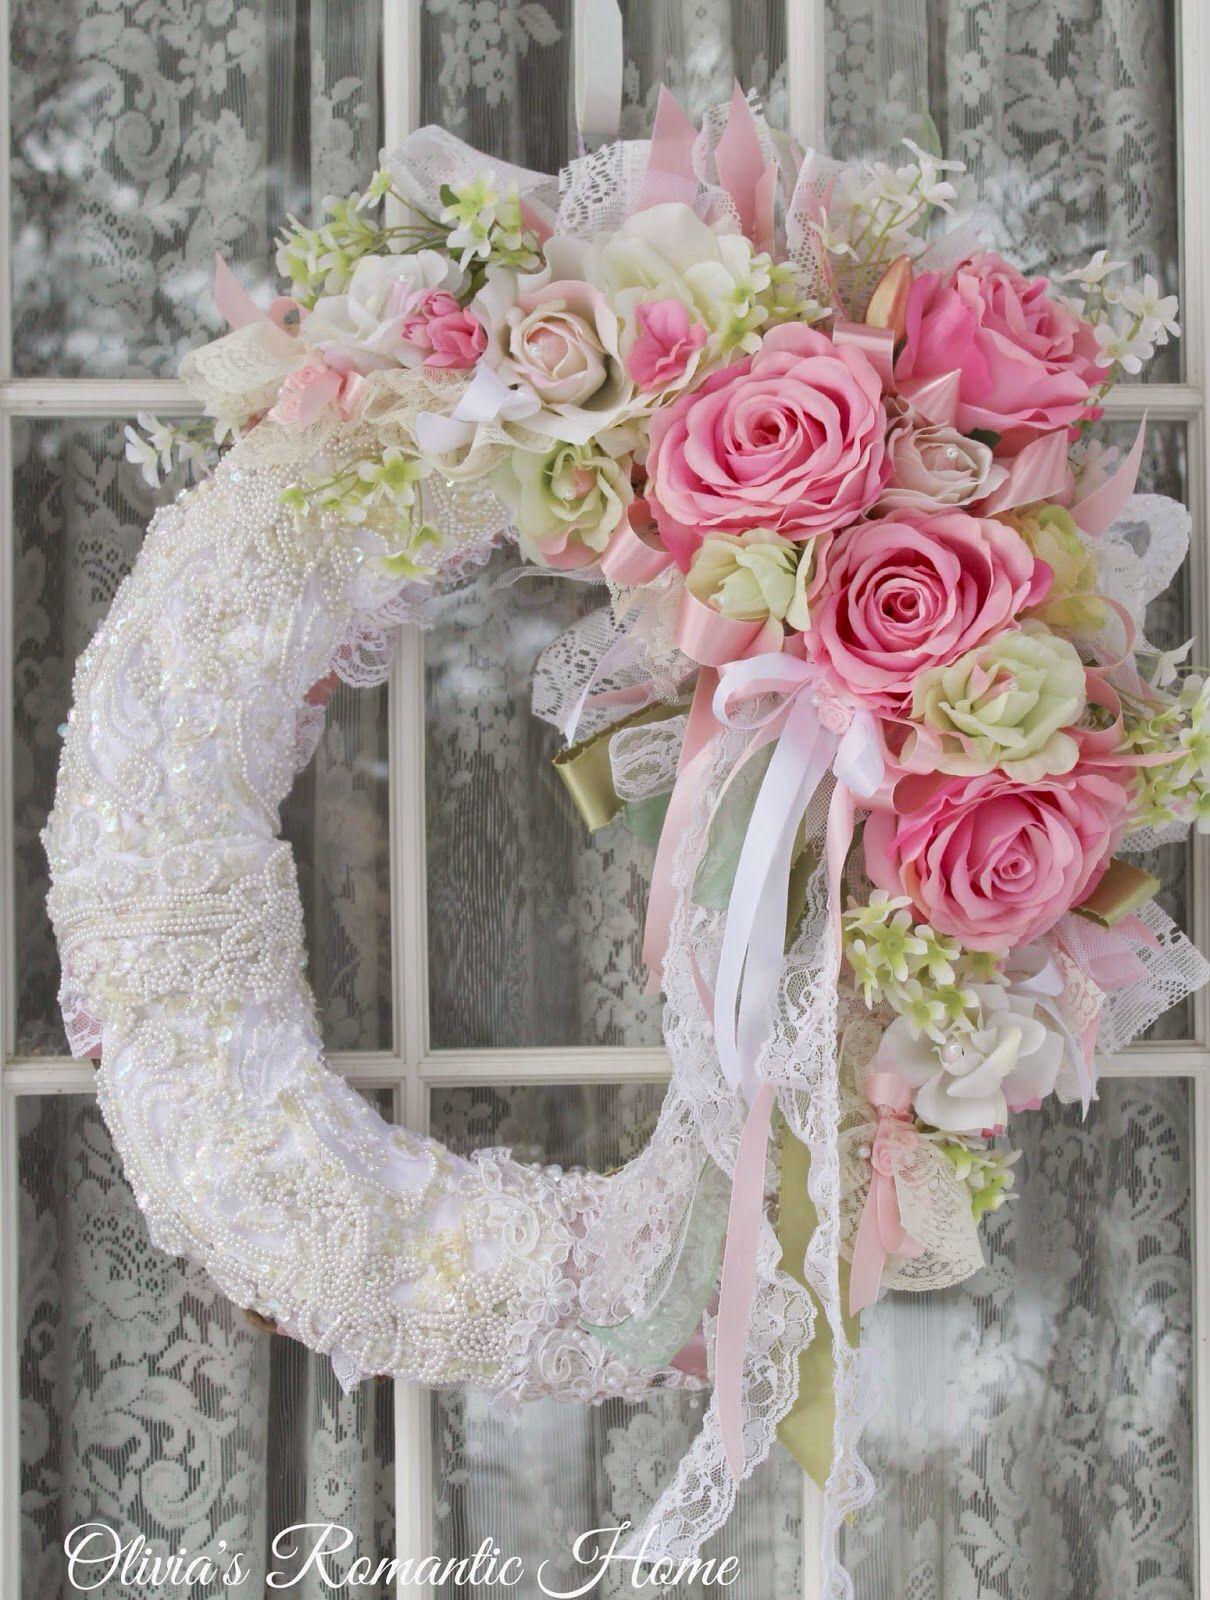 rosecottage.quenalbertini: Pink rose wreath